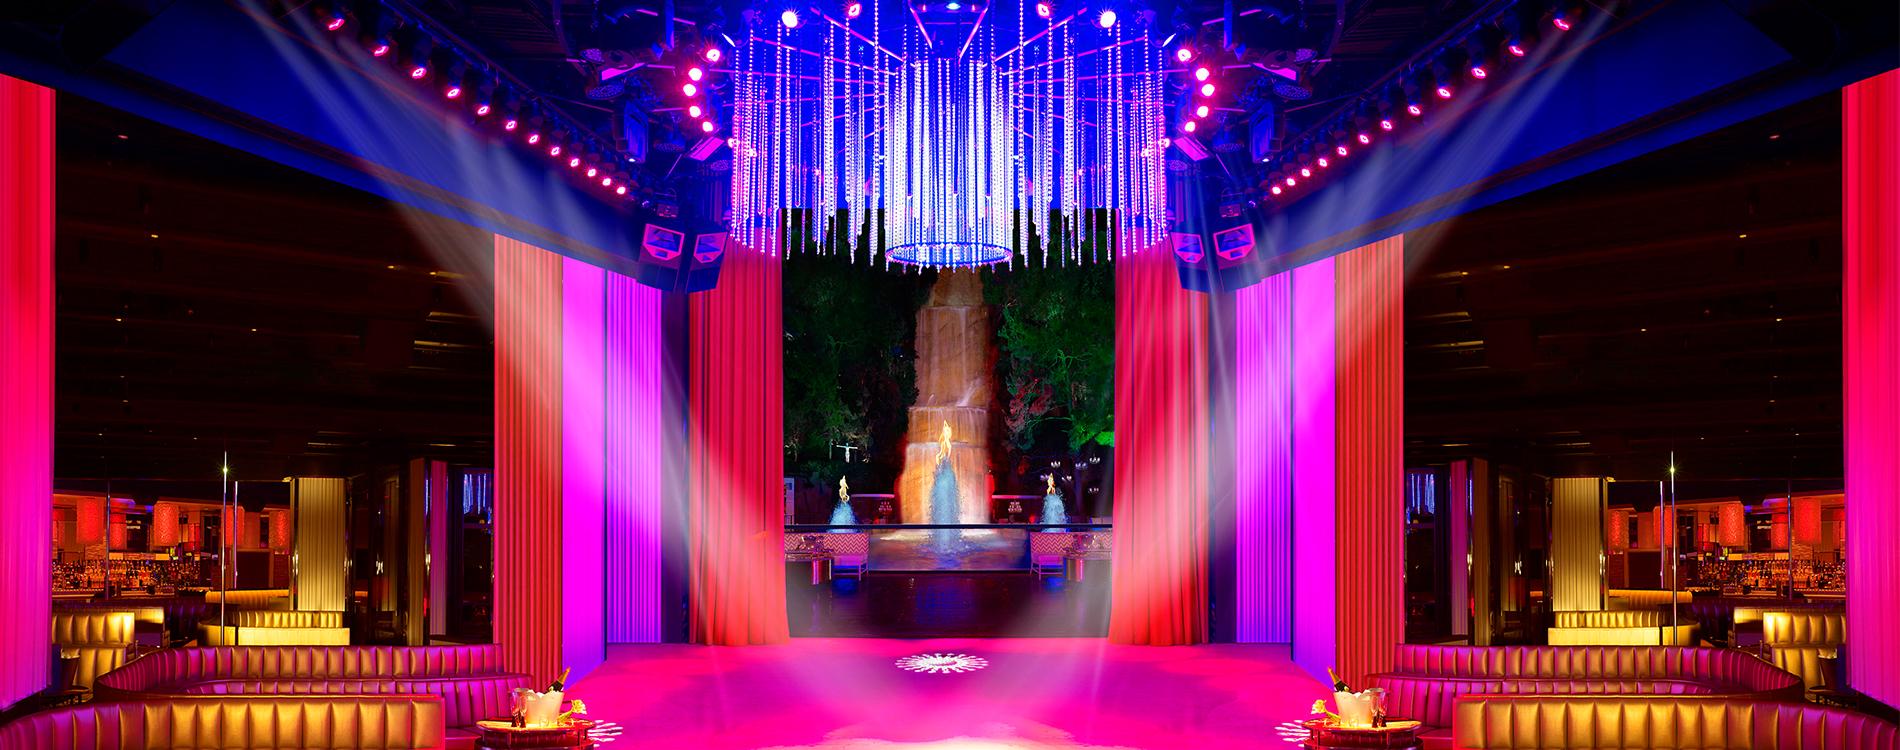 Wynn Las Vegas Elevates Nightlife Design With The Introduction Of Intrigue  Nightclub